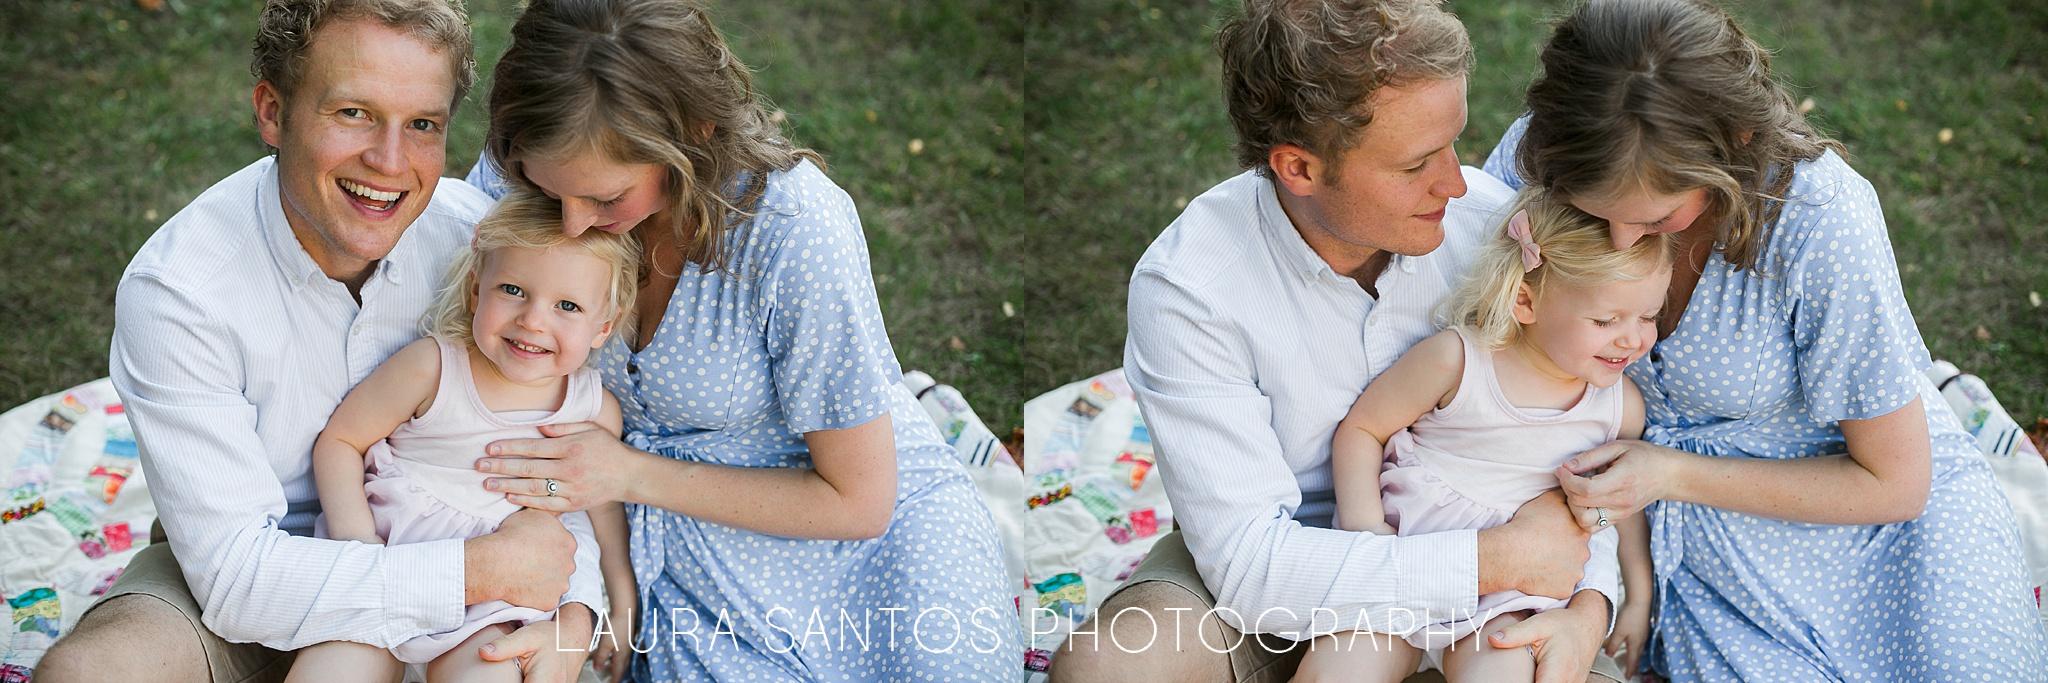 Laura Santos Photography Portland Oregon Family Photographer_0735.jpg